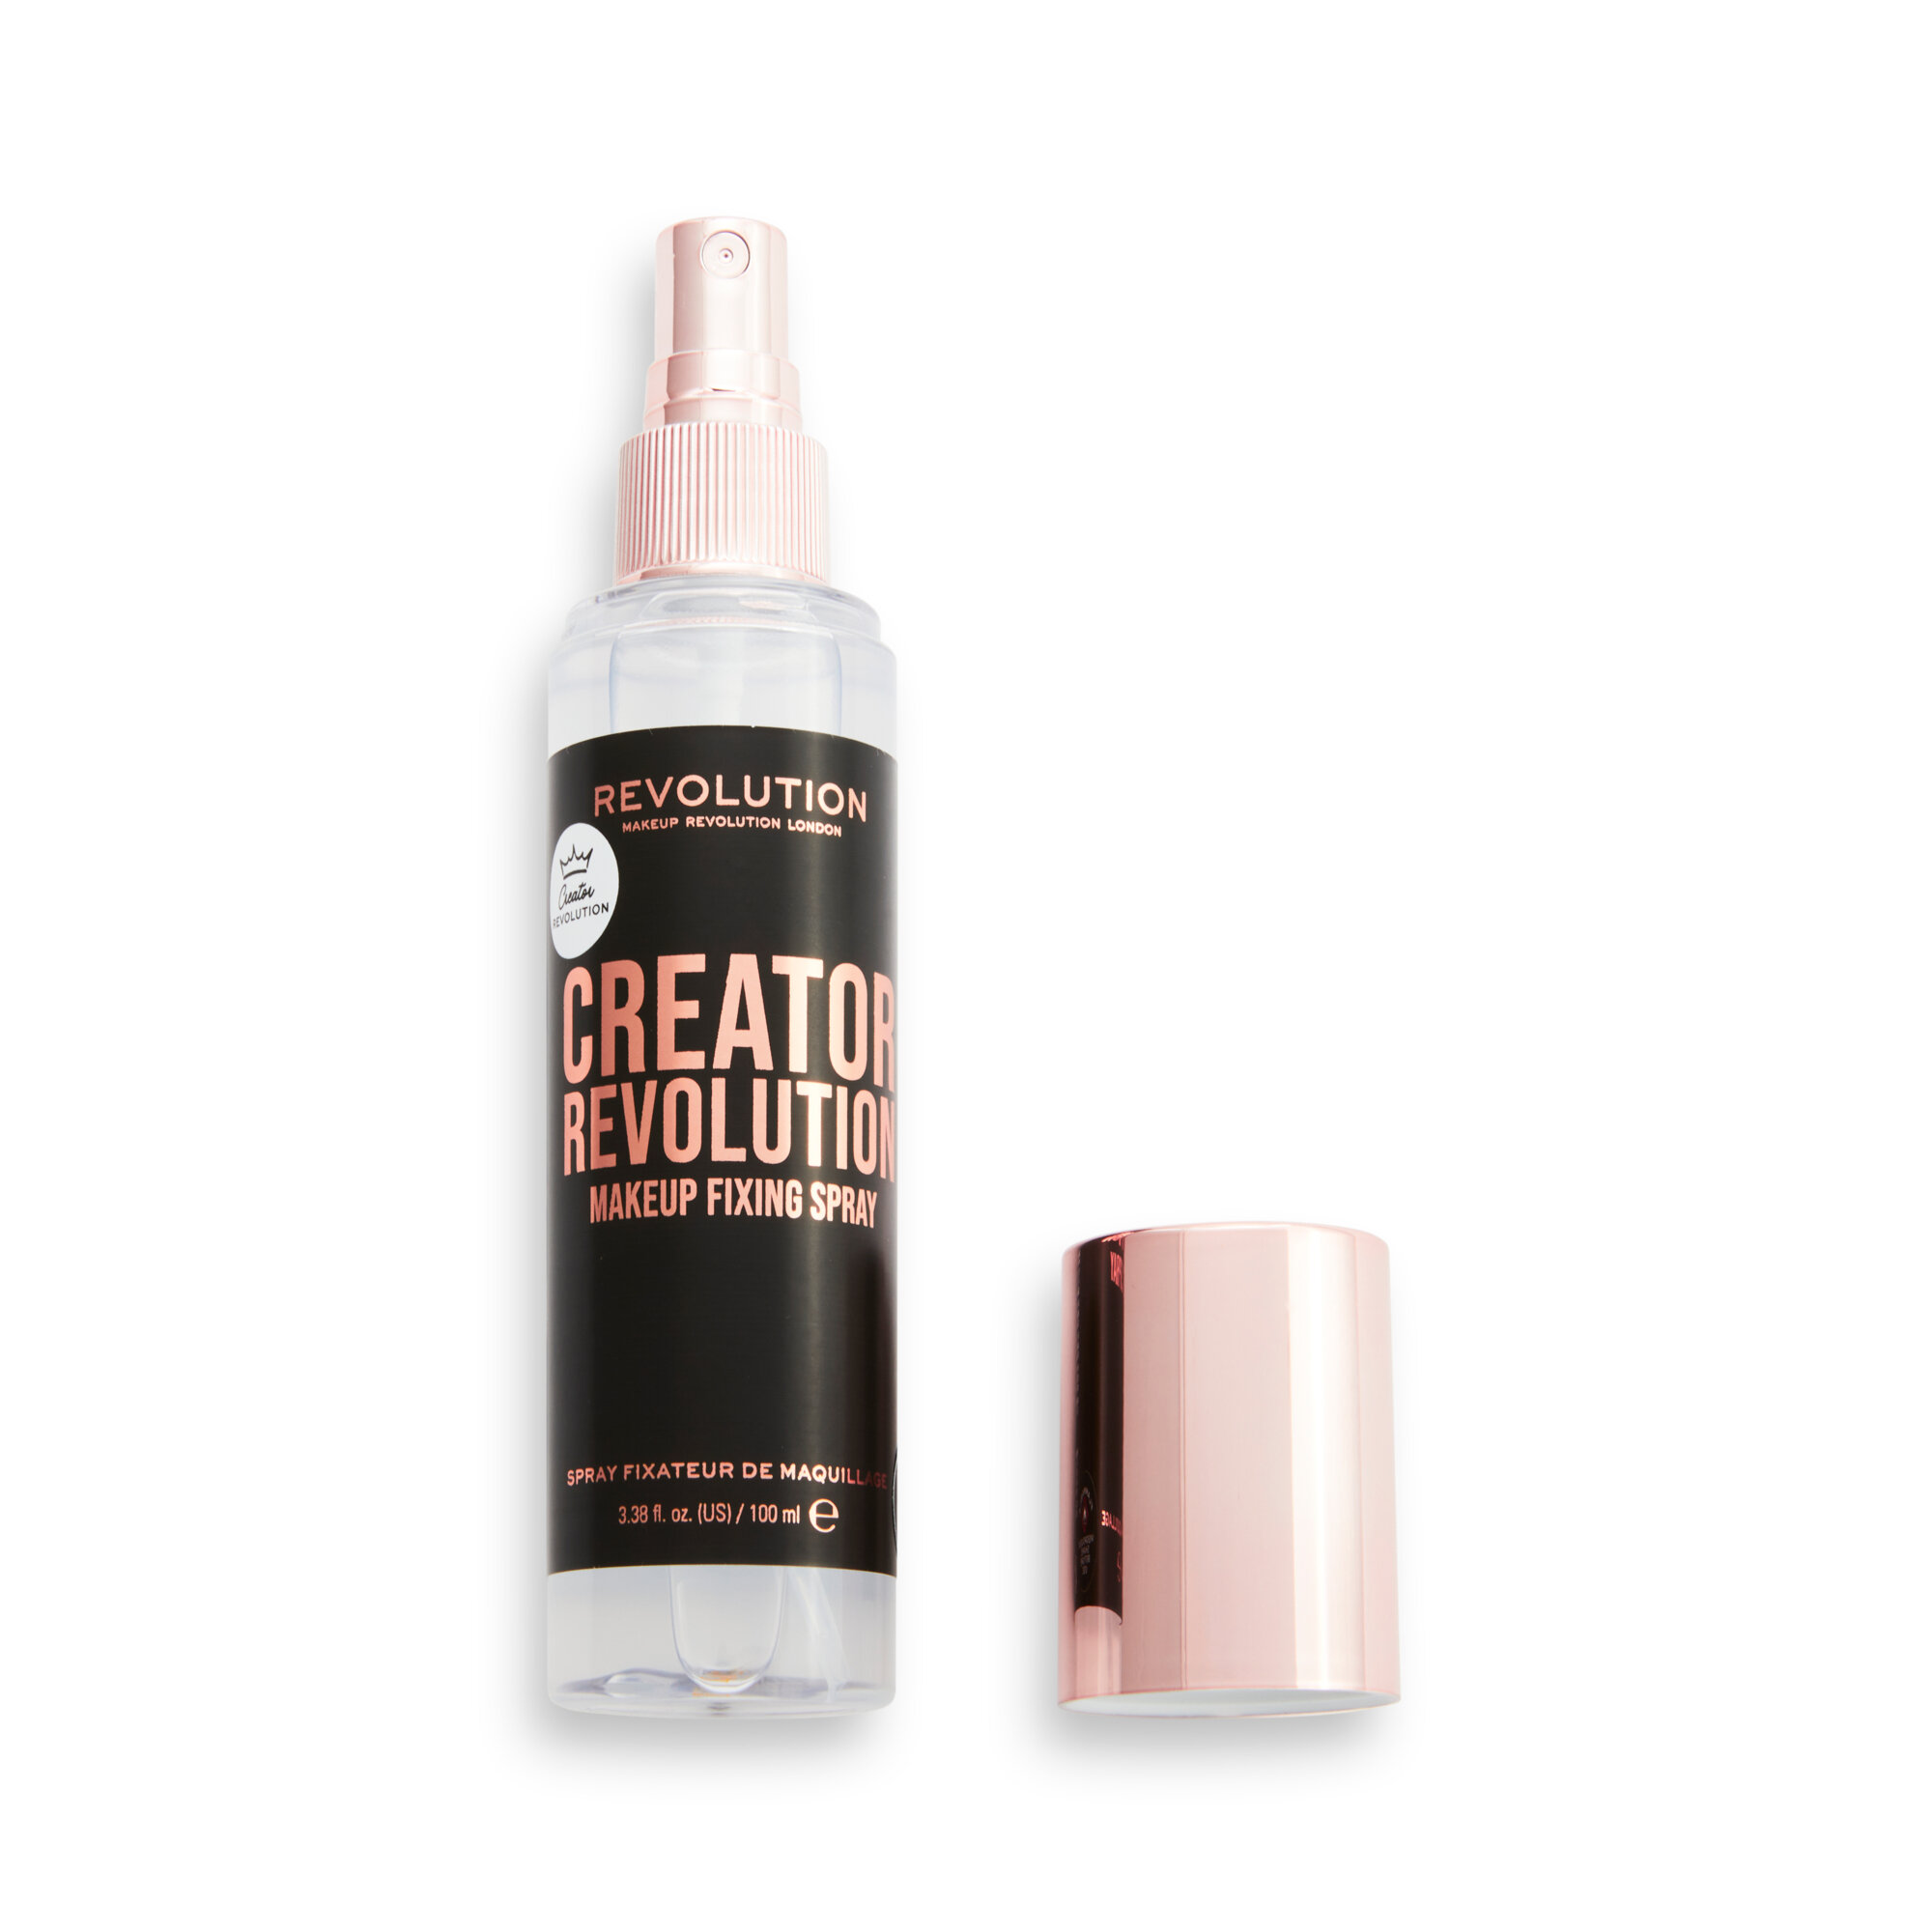 Creator Revolution Drag Fix Setting Spray